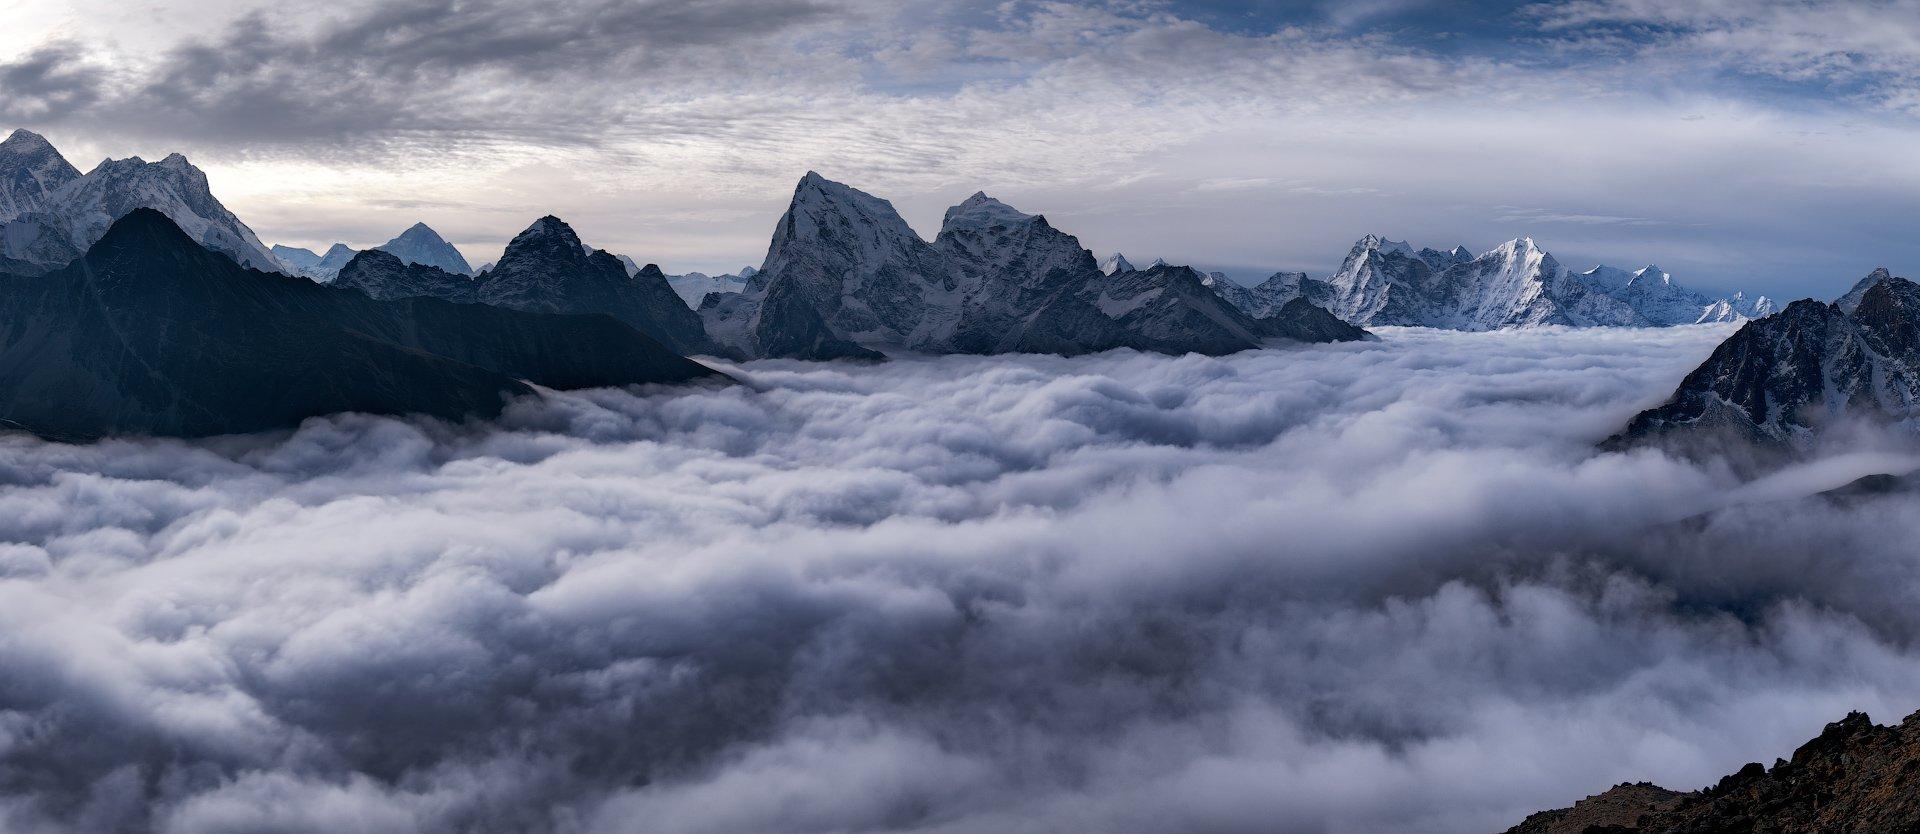 Гималаи, Гокио Ри, Непал, Облака, Рассвет, Алексей Харитонов